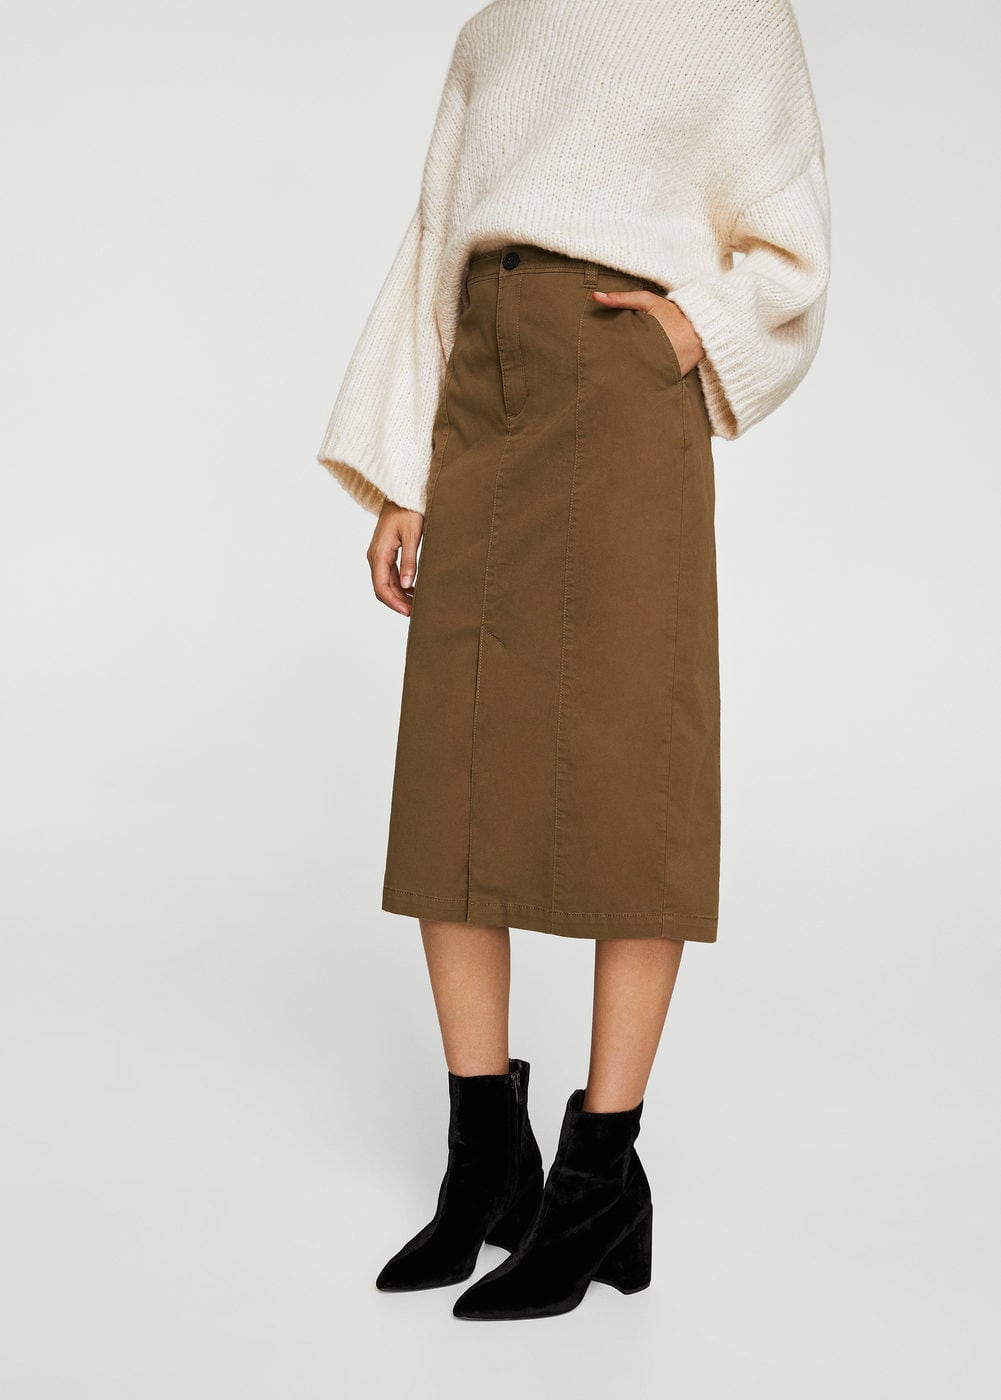 fashion, style, street style, midi skirt, mango, shopping, haul, personal style